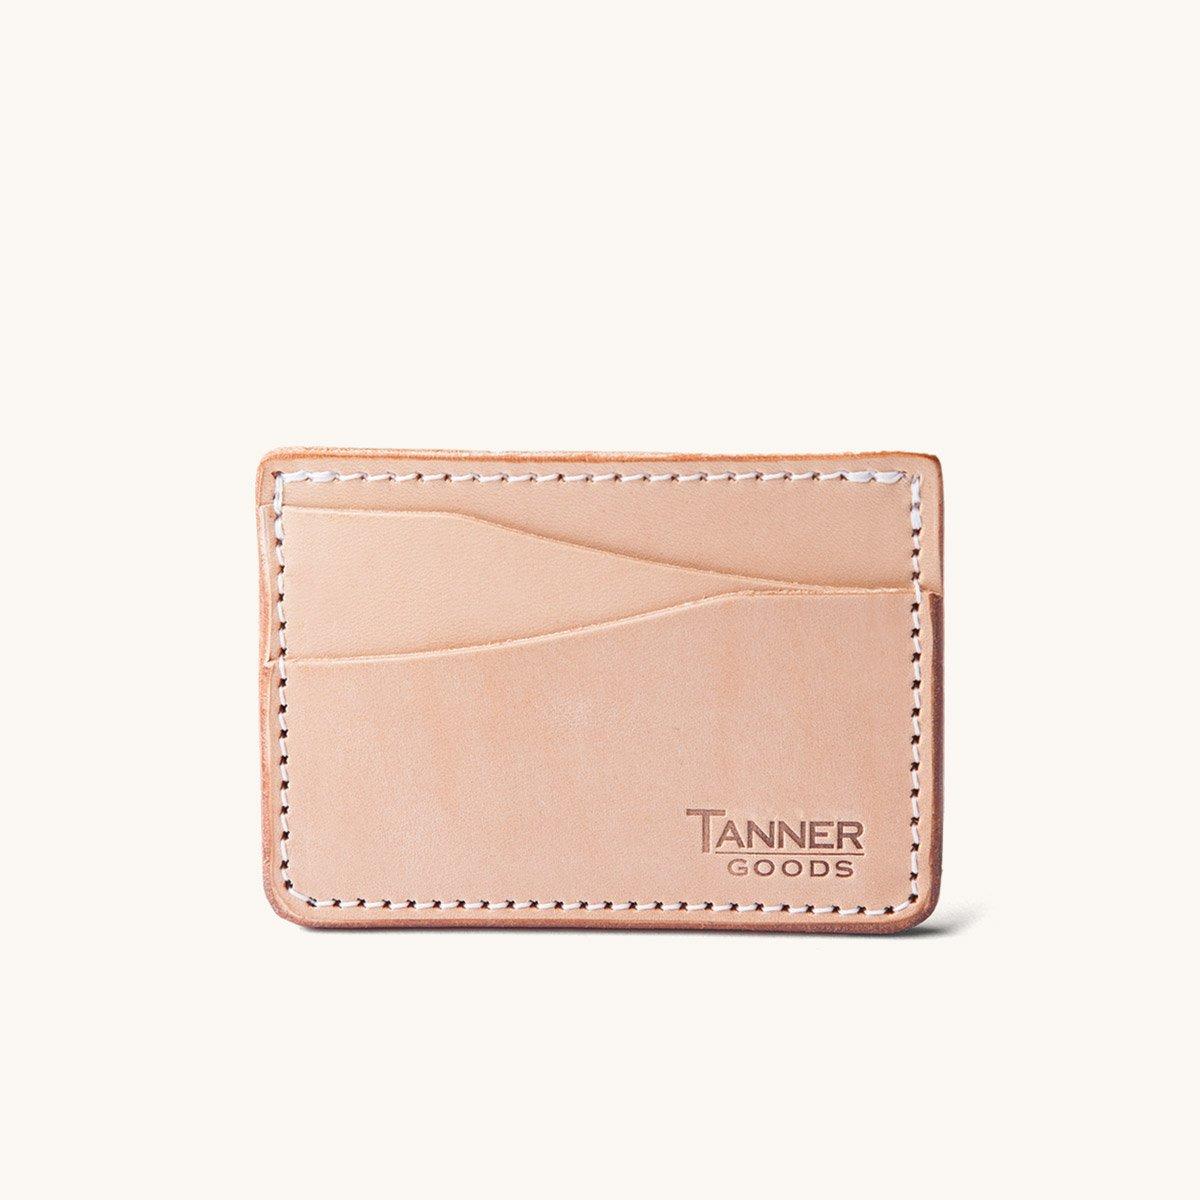 Tanner Goods Journeyman Wallet in Natural